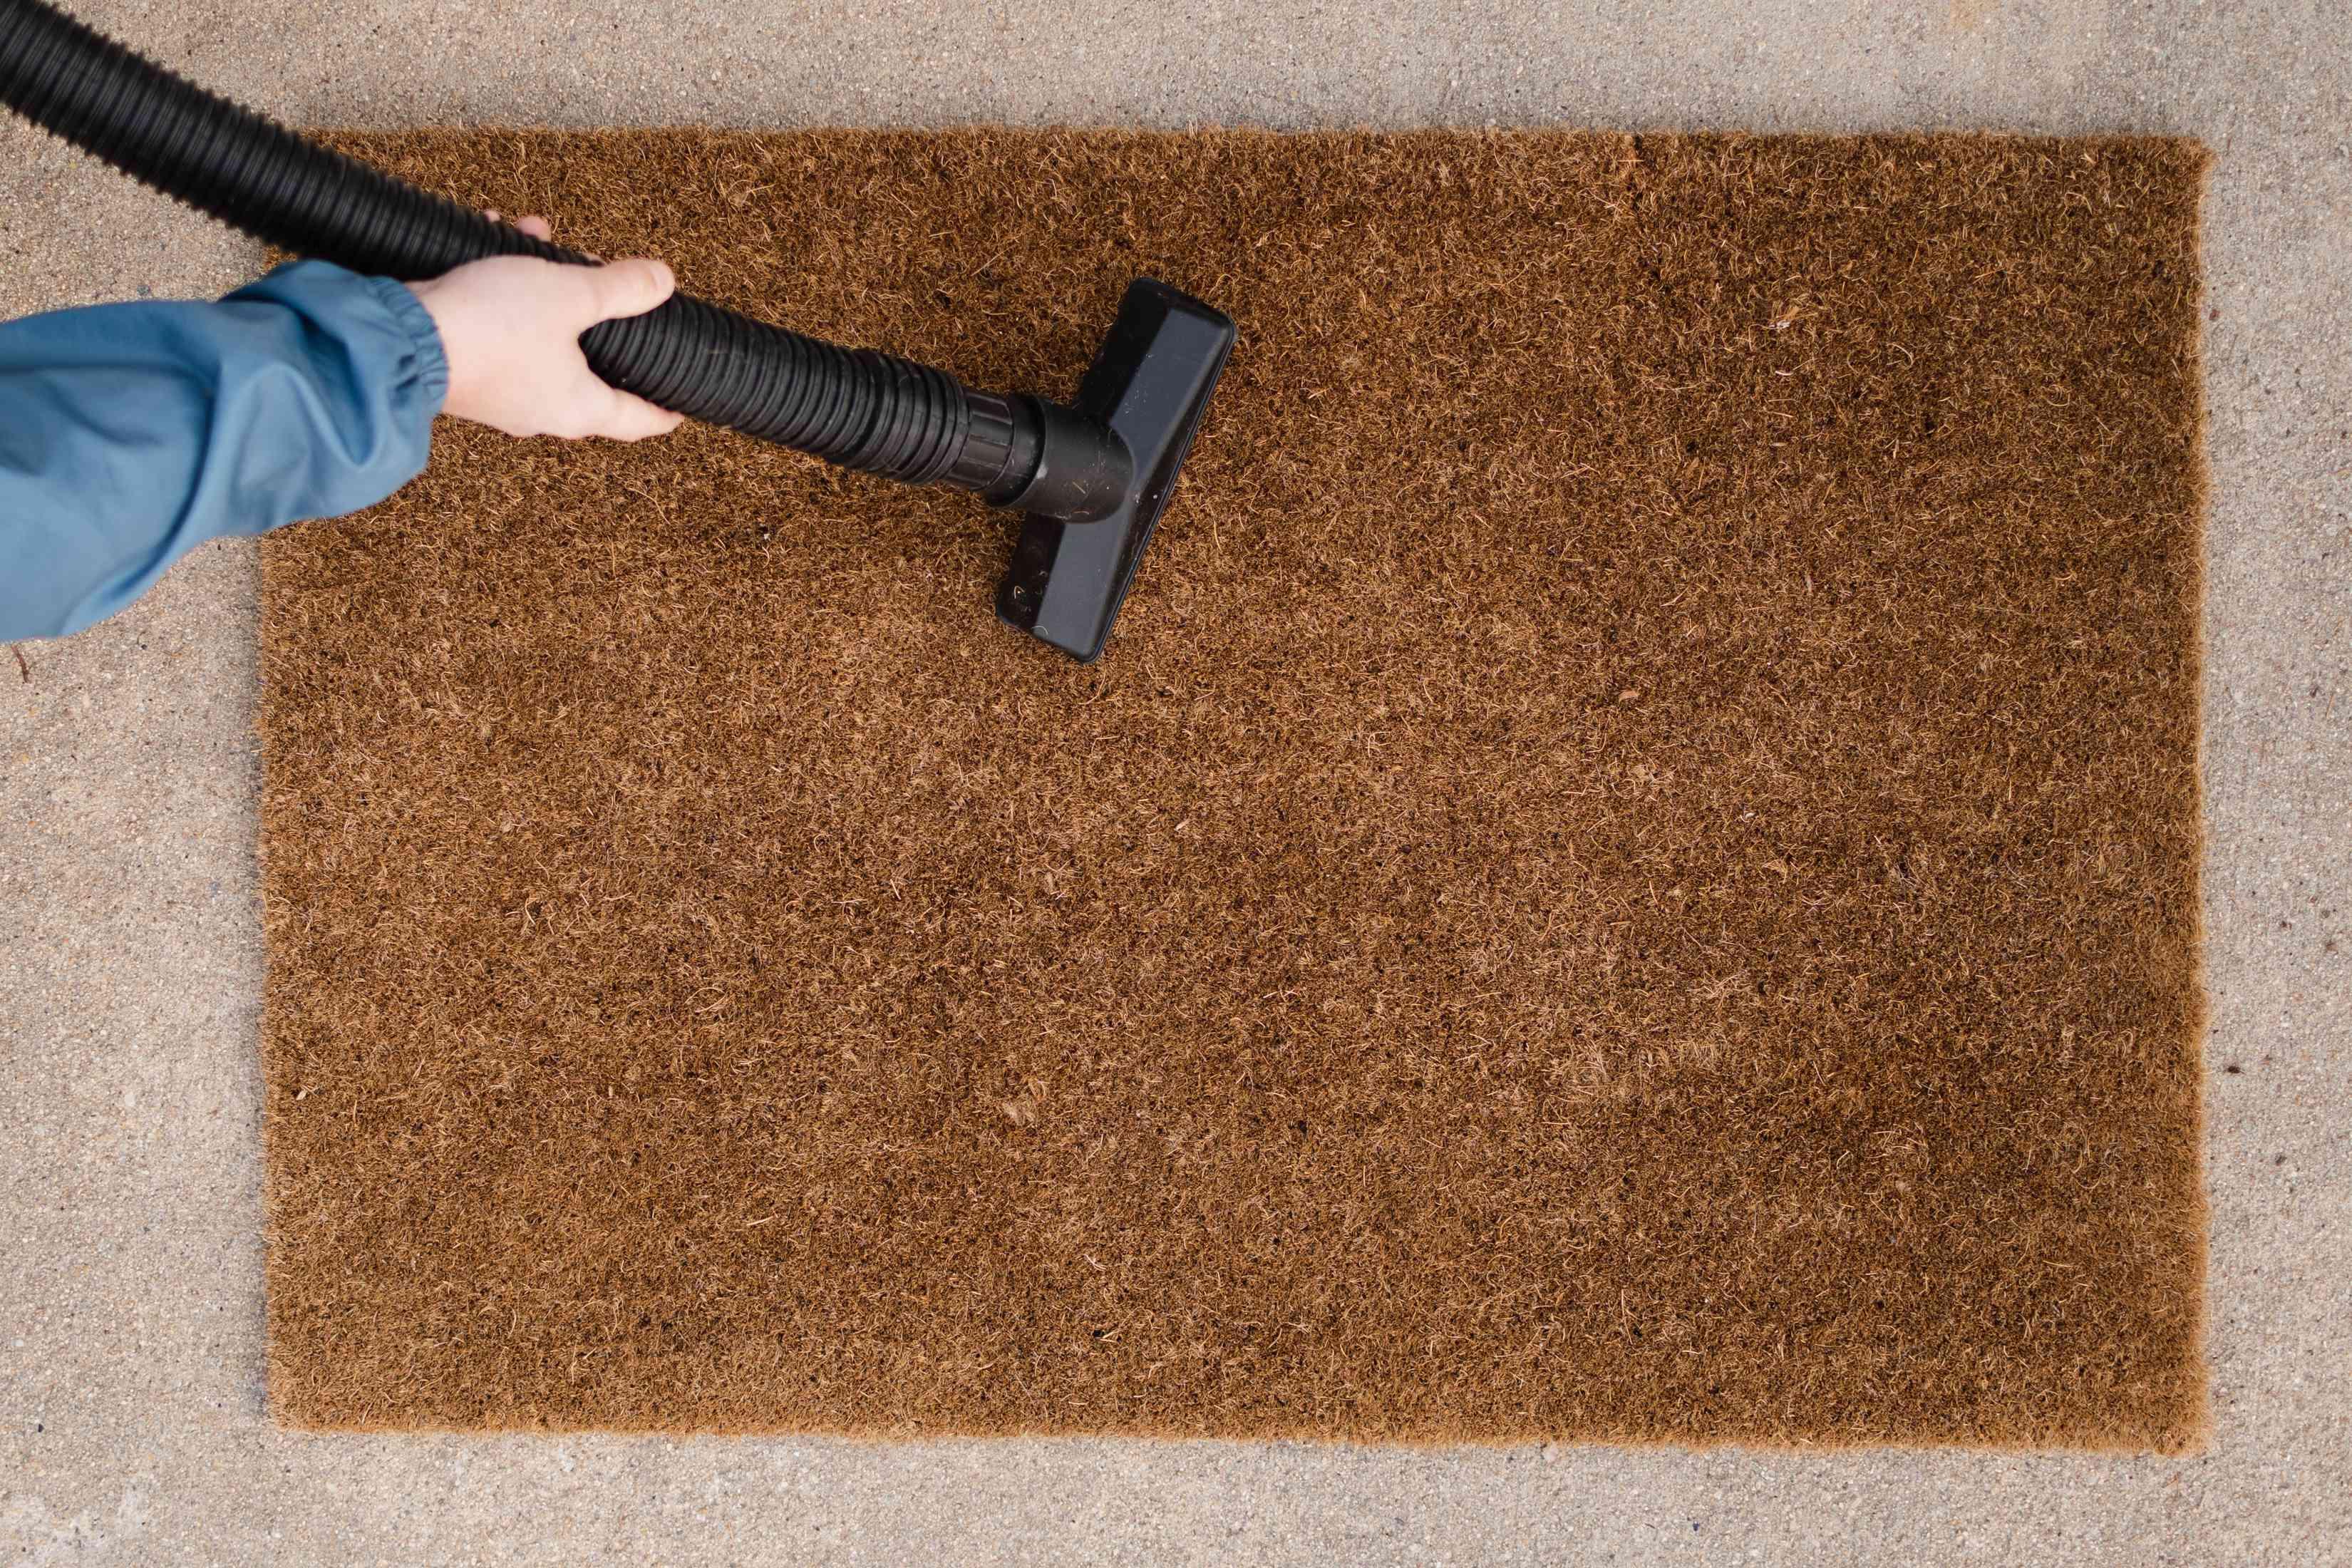 Black vacuum hose passing over brown doormat for deeper cleaning